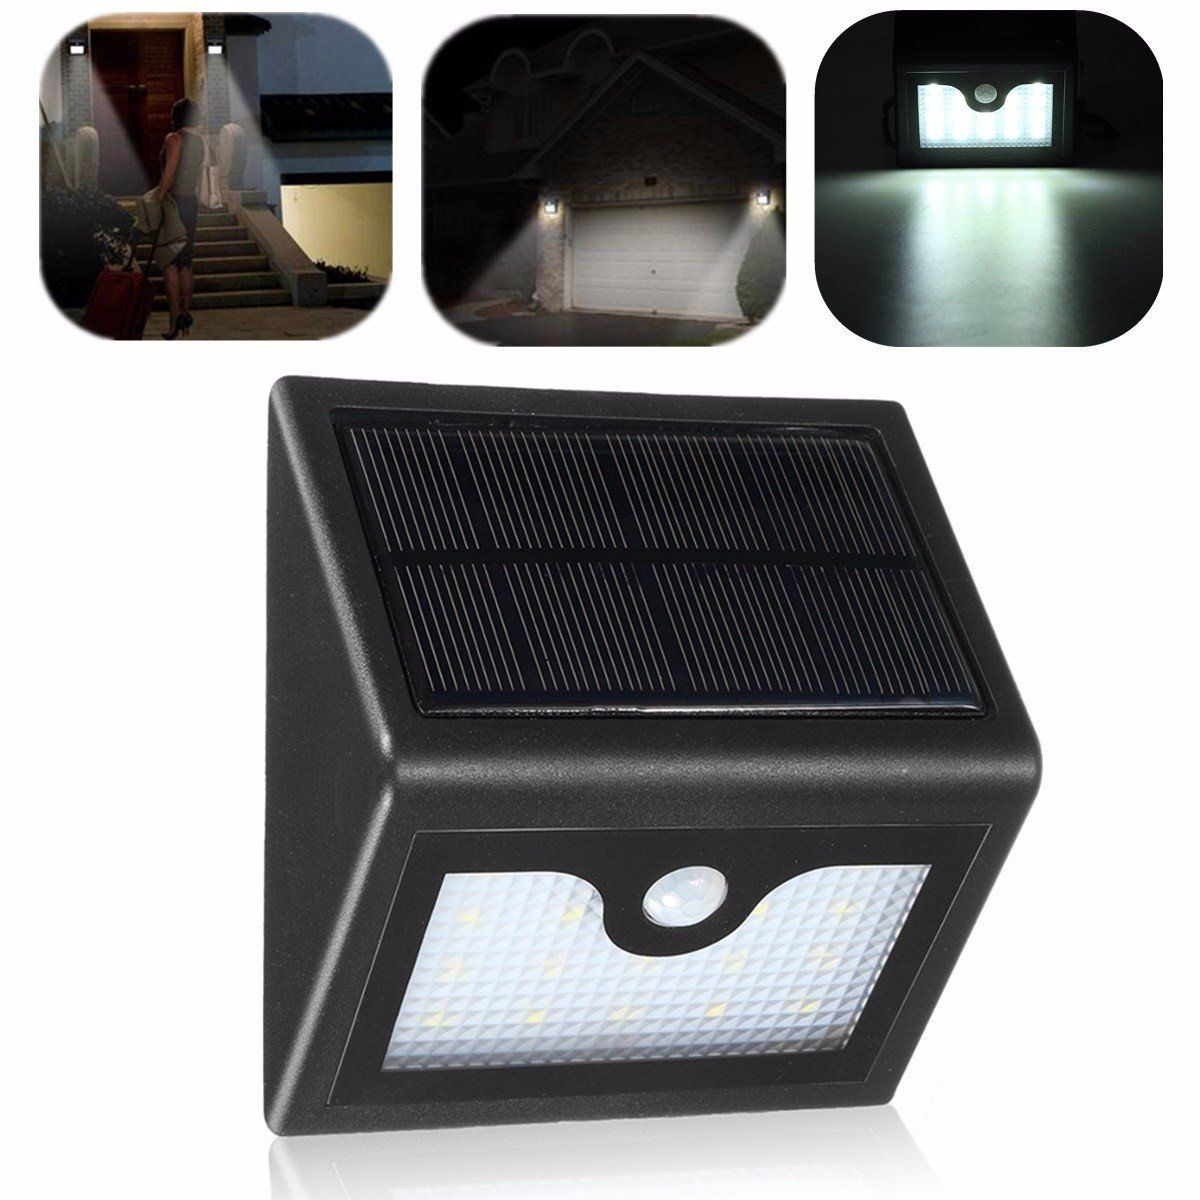 16 Led Solar Power Pir Motion Sensor Wall Light Outdoor Waterproof Garden Lamp Outdoor Lighting From Lights Lighting On Banggood Com Outdoor Wall Lighting Outdoor Lighting Motion Sensor Lights